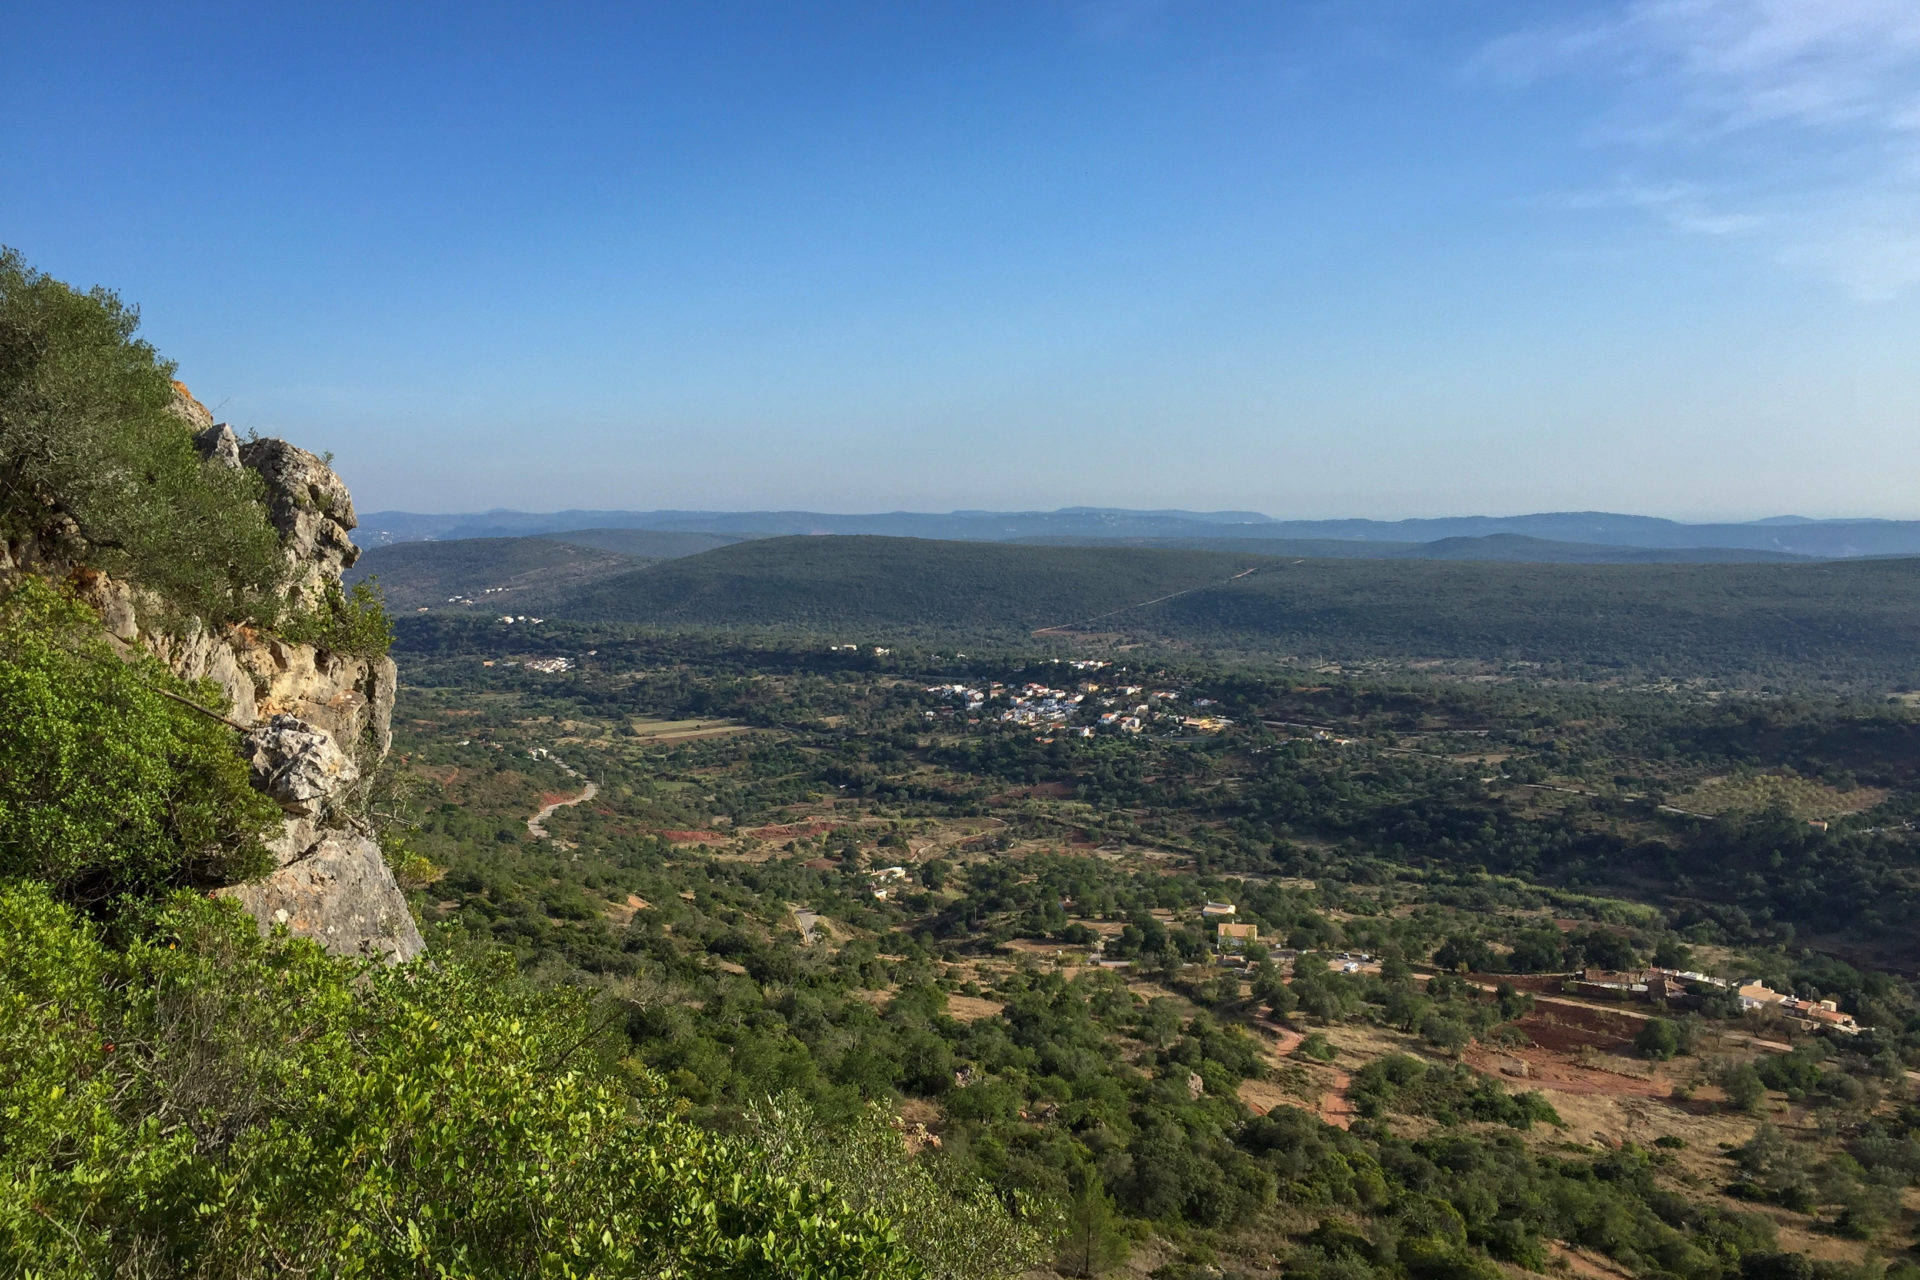 Blick vom Rocha da Pena an der Algarve